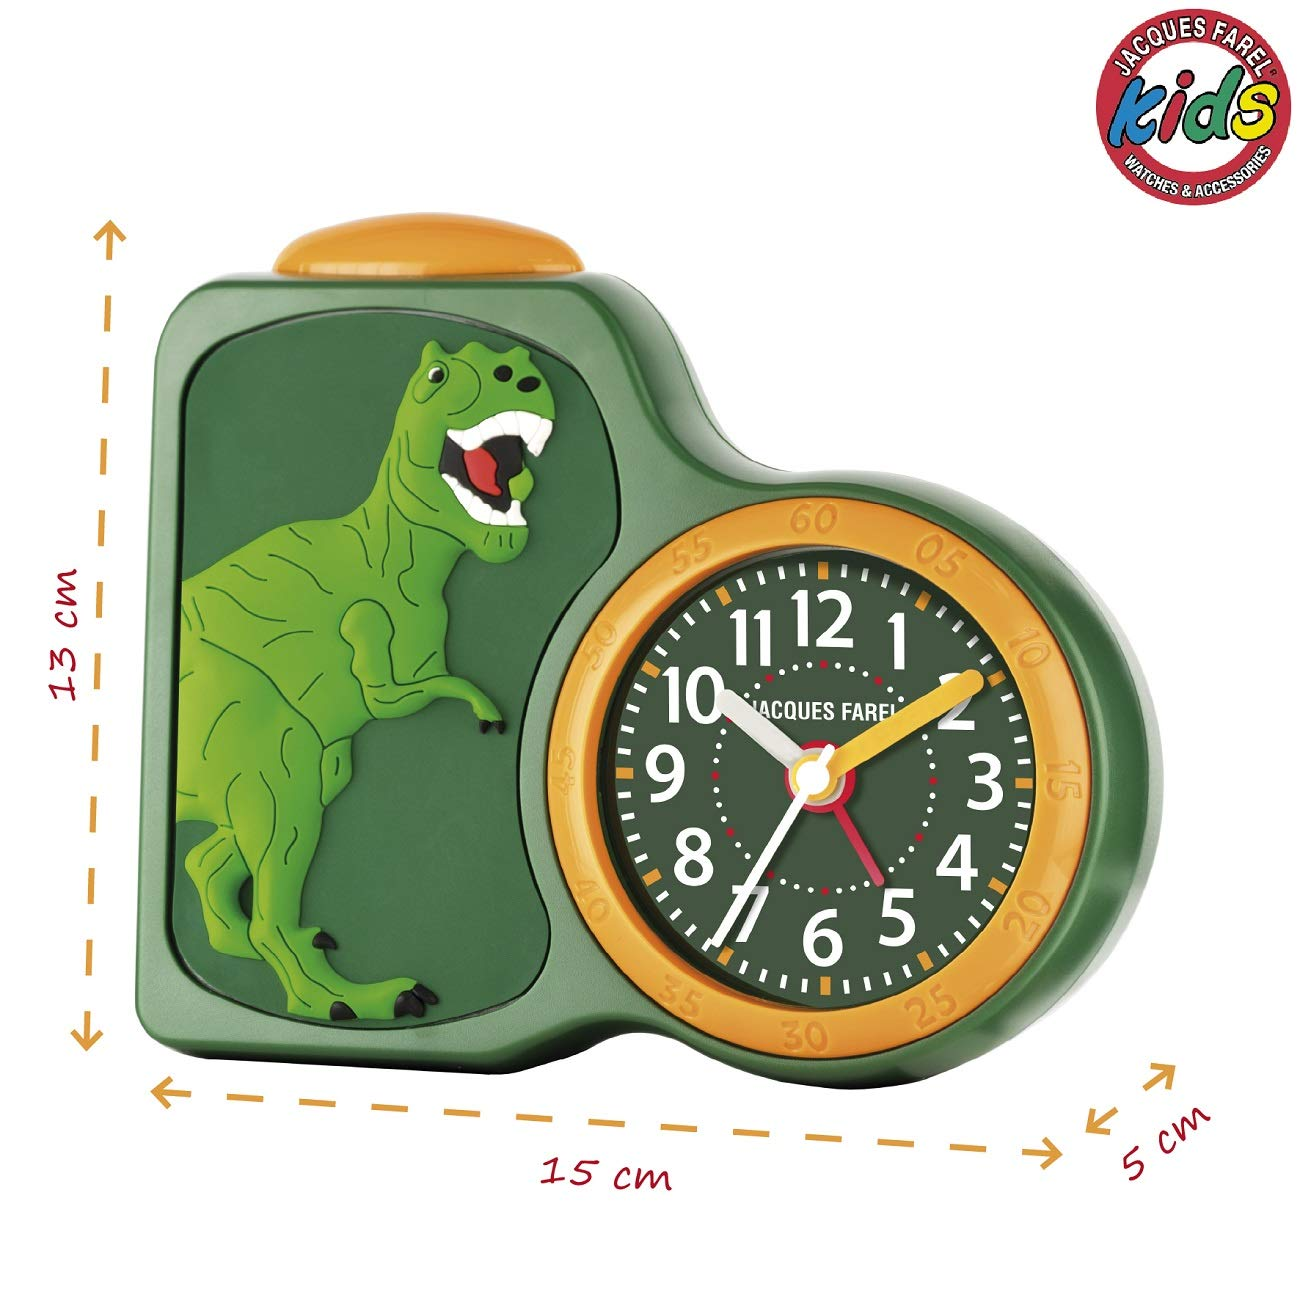 JACQUES FAREL/ con luz y repetici/ón ACB 06dino /Despertador Infantil ni/ño Dinosaurios Verde sin Tic TAC